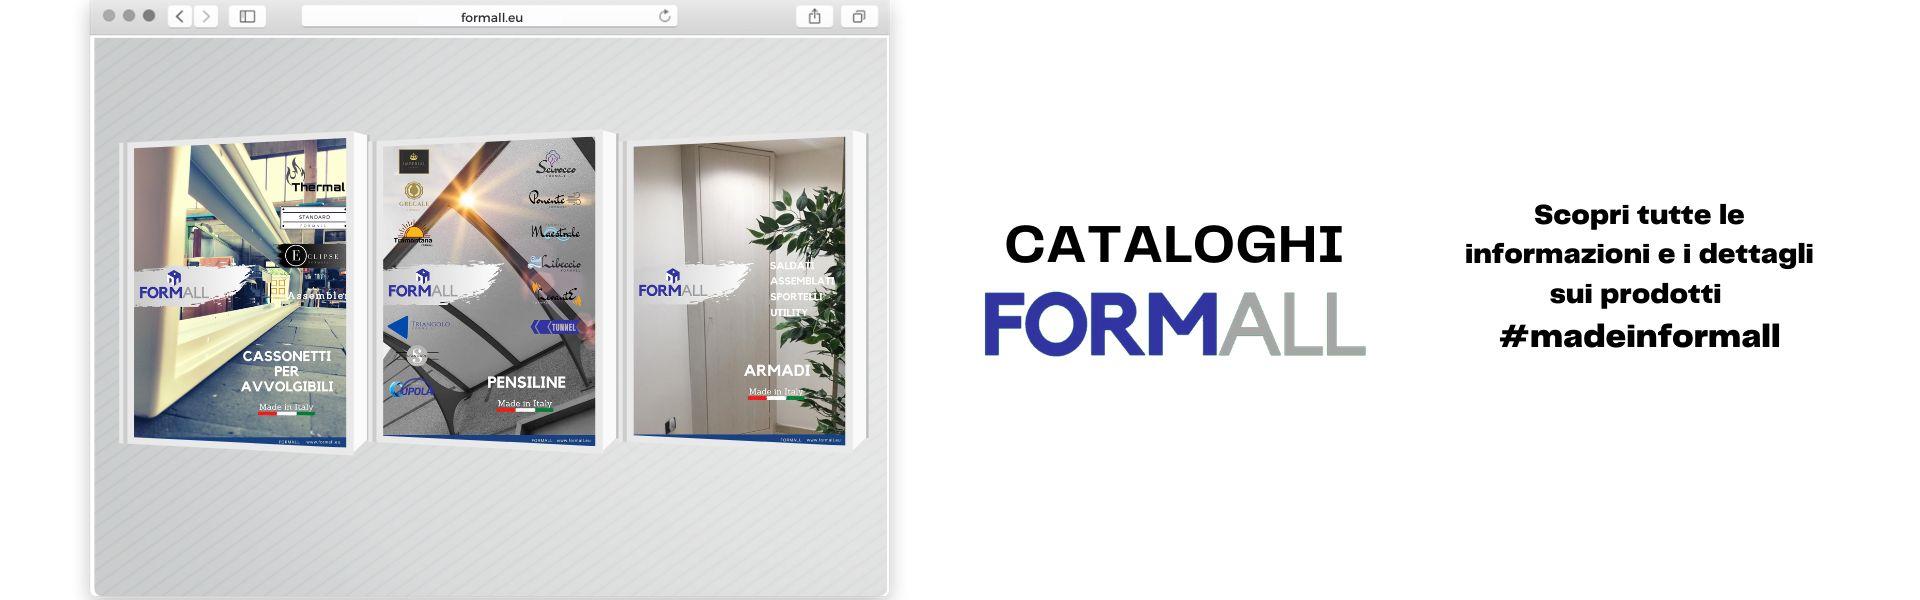 Cataloghi Formall